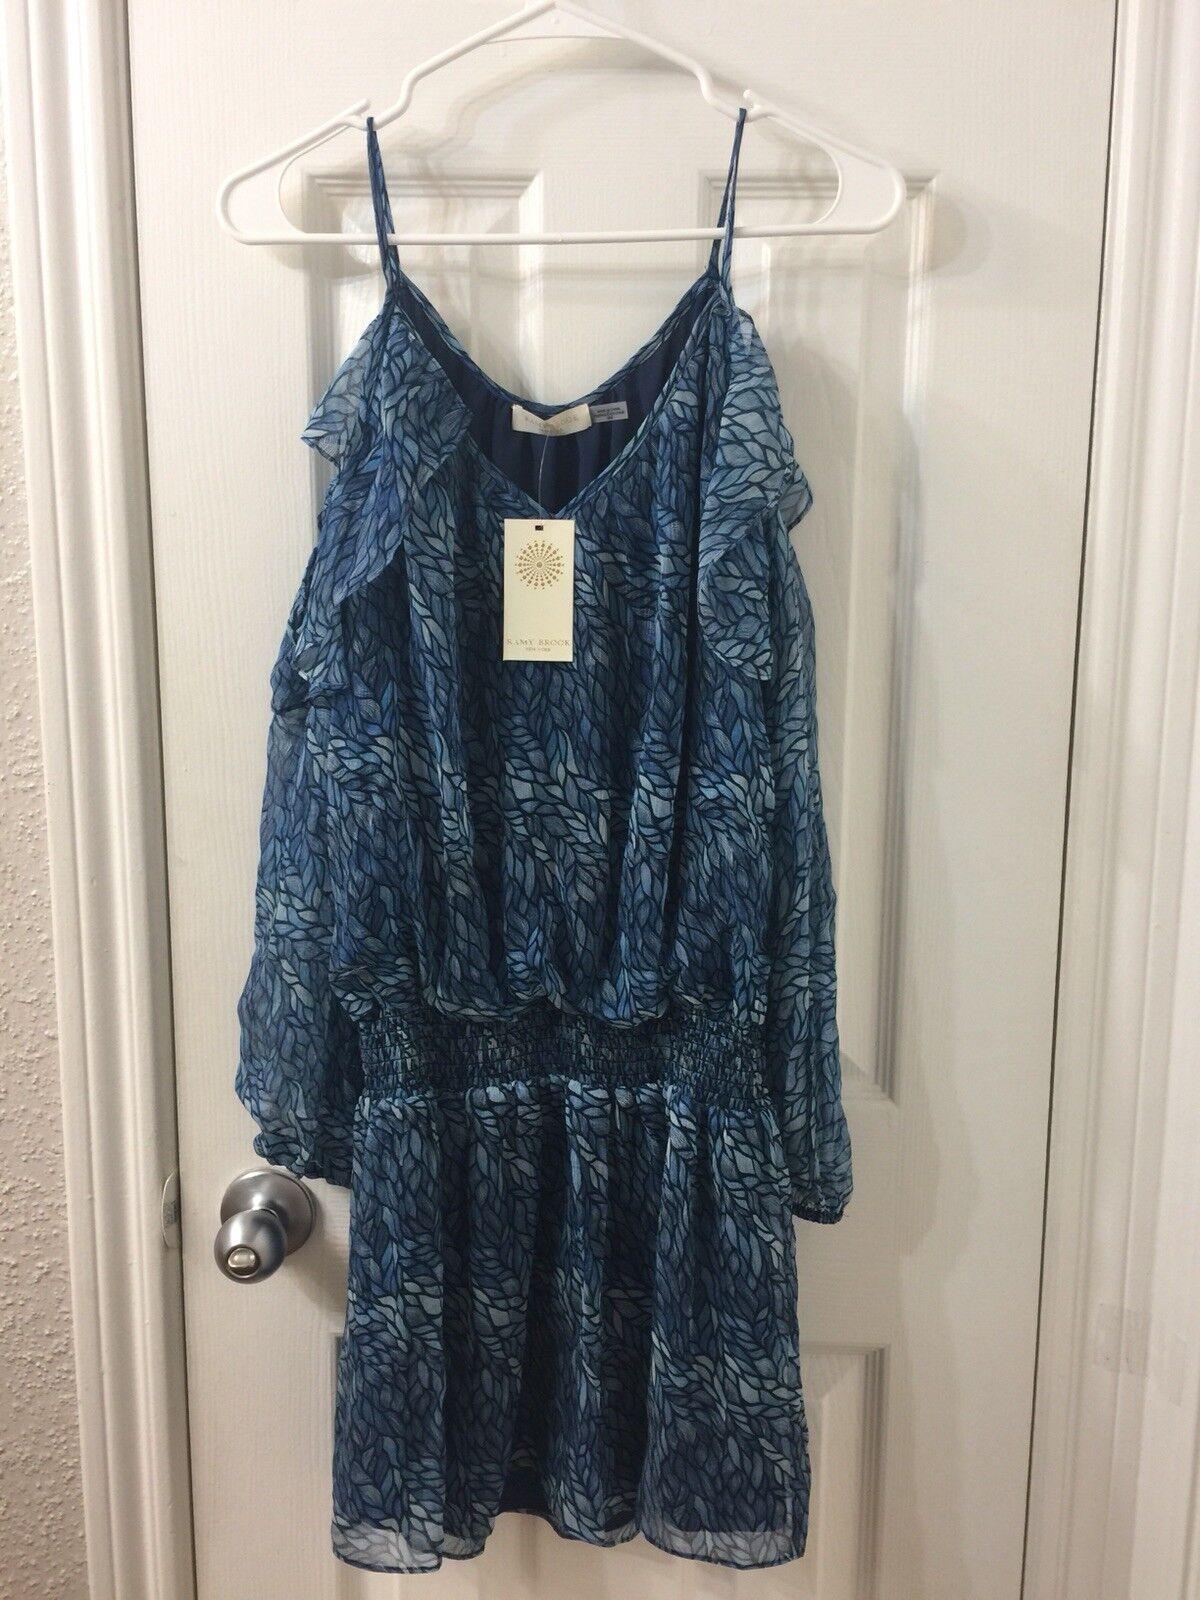 Ramy brook Blau Cold Shoulder Kleid Sz M